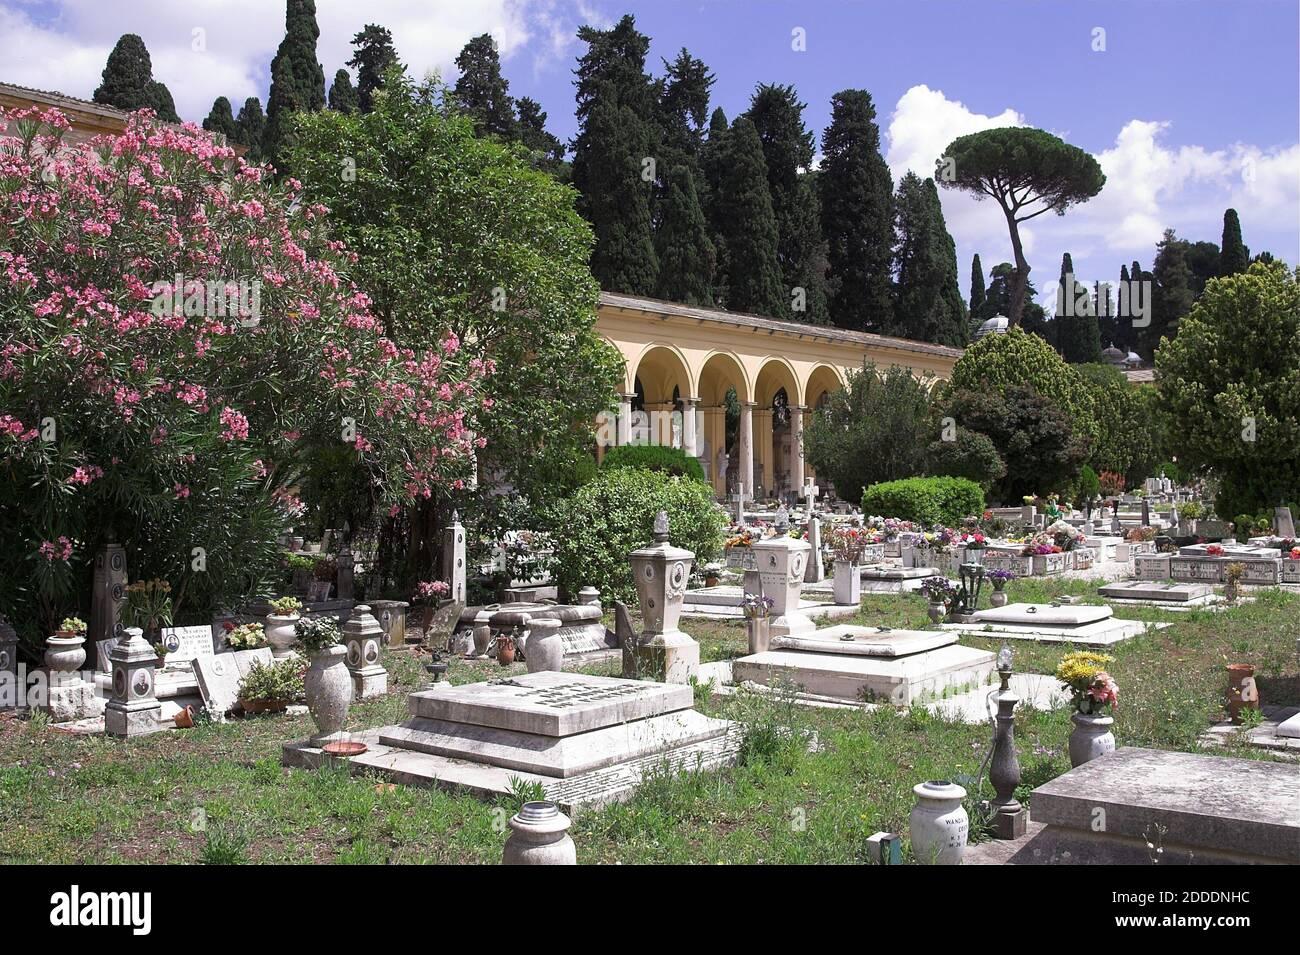 Roma, Rom, Italy, Italien; Cimitero del Verano; Campo Verano; Old mossy tombstones among the greenery. Alte moosige Grabsteine im Grünen. Stock Photo